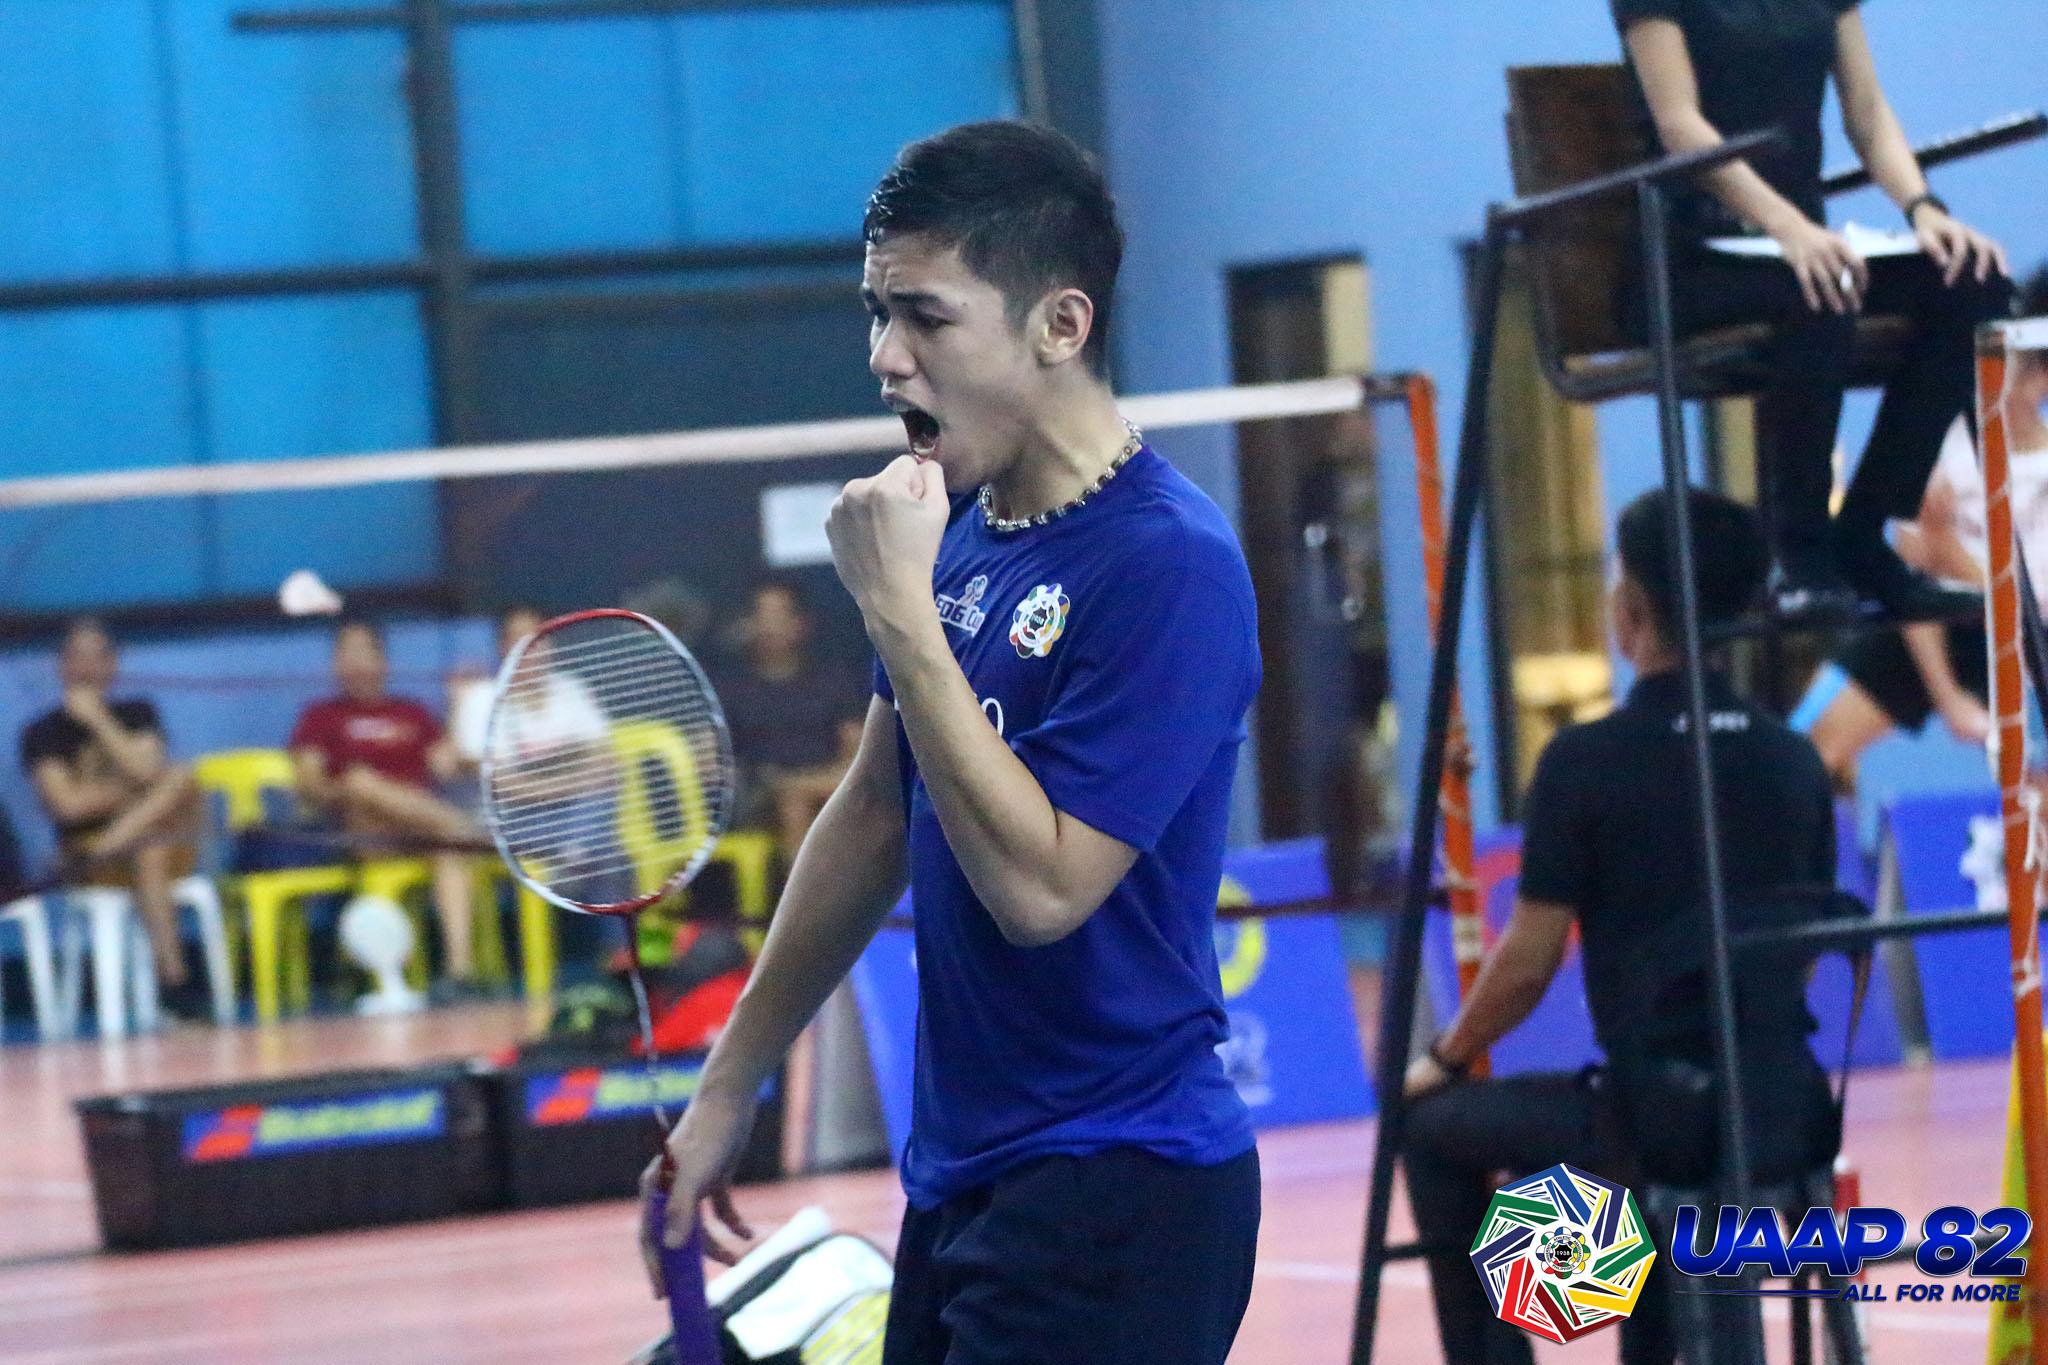 UAAP-82-Mens-Badminton-Semifinal-ADMU-v-DLSU-Salvado-Jr NU Bulldogs, Ateneo Blue Eagles book UAAP Men's Badminton Finals date ADMU Badminton DLSU News NU UAAP UP  - philippine sports news